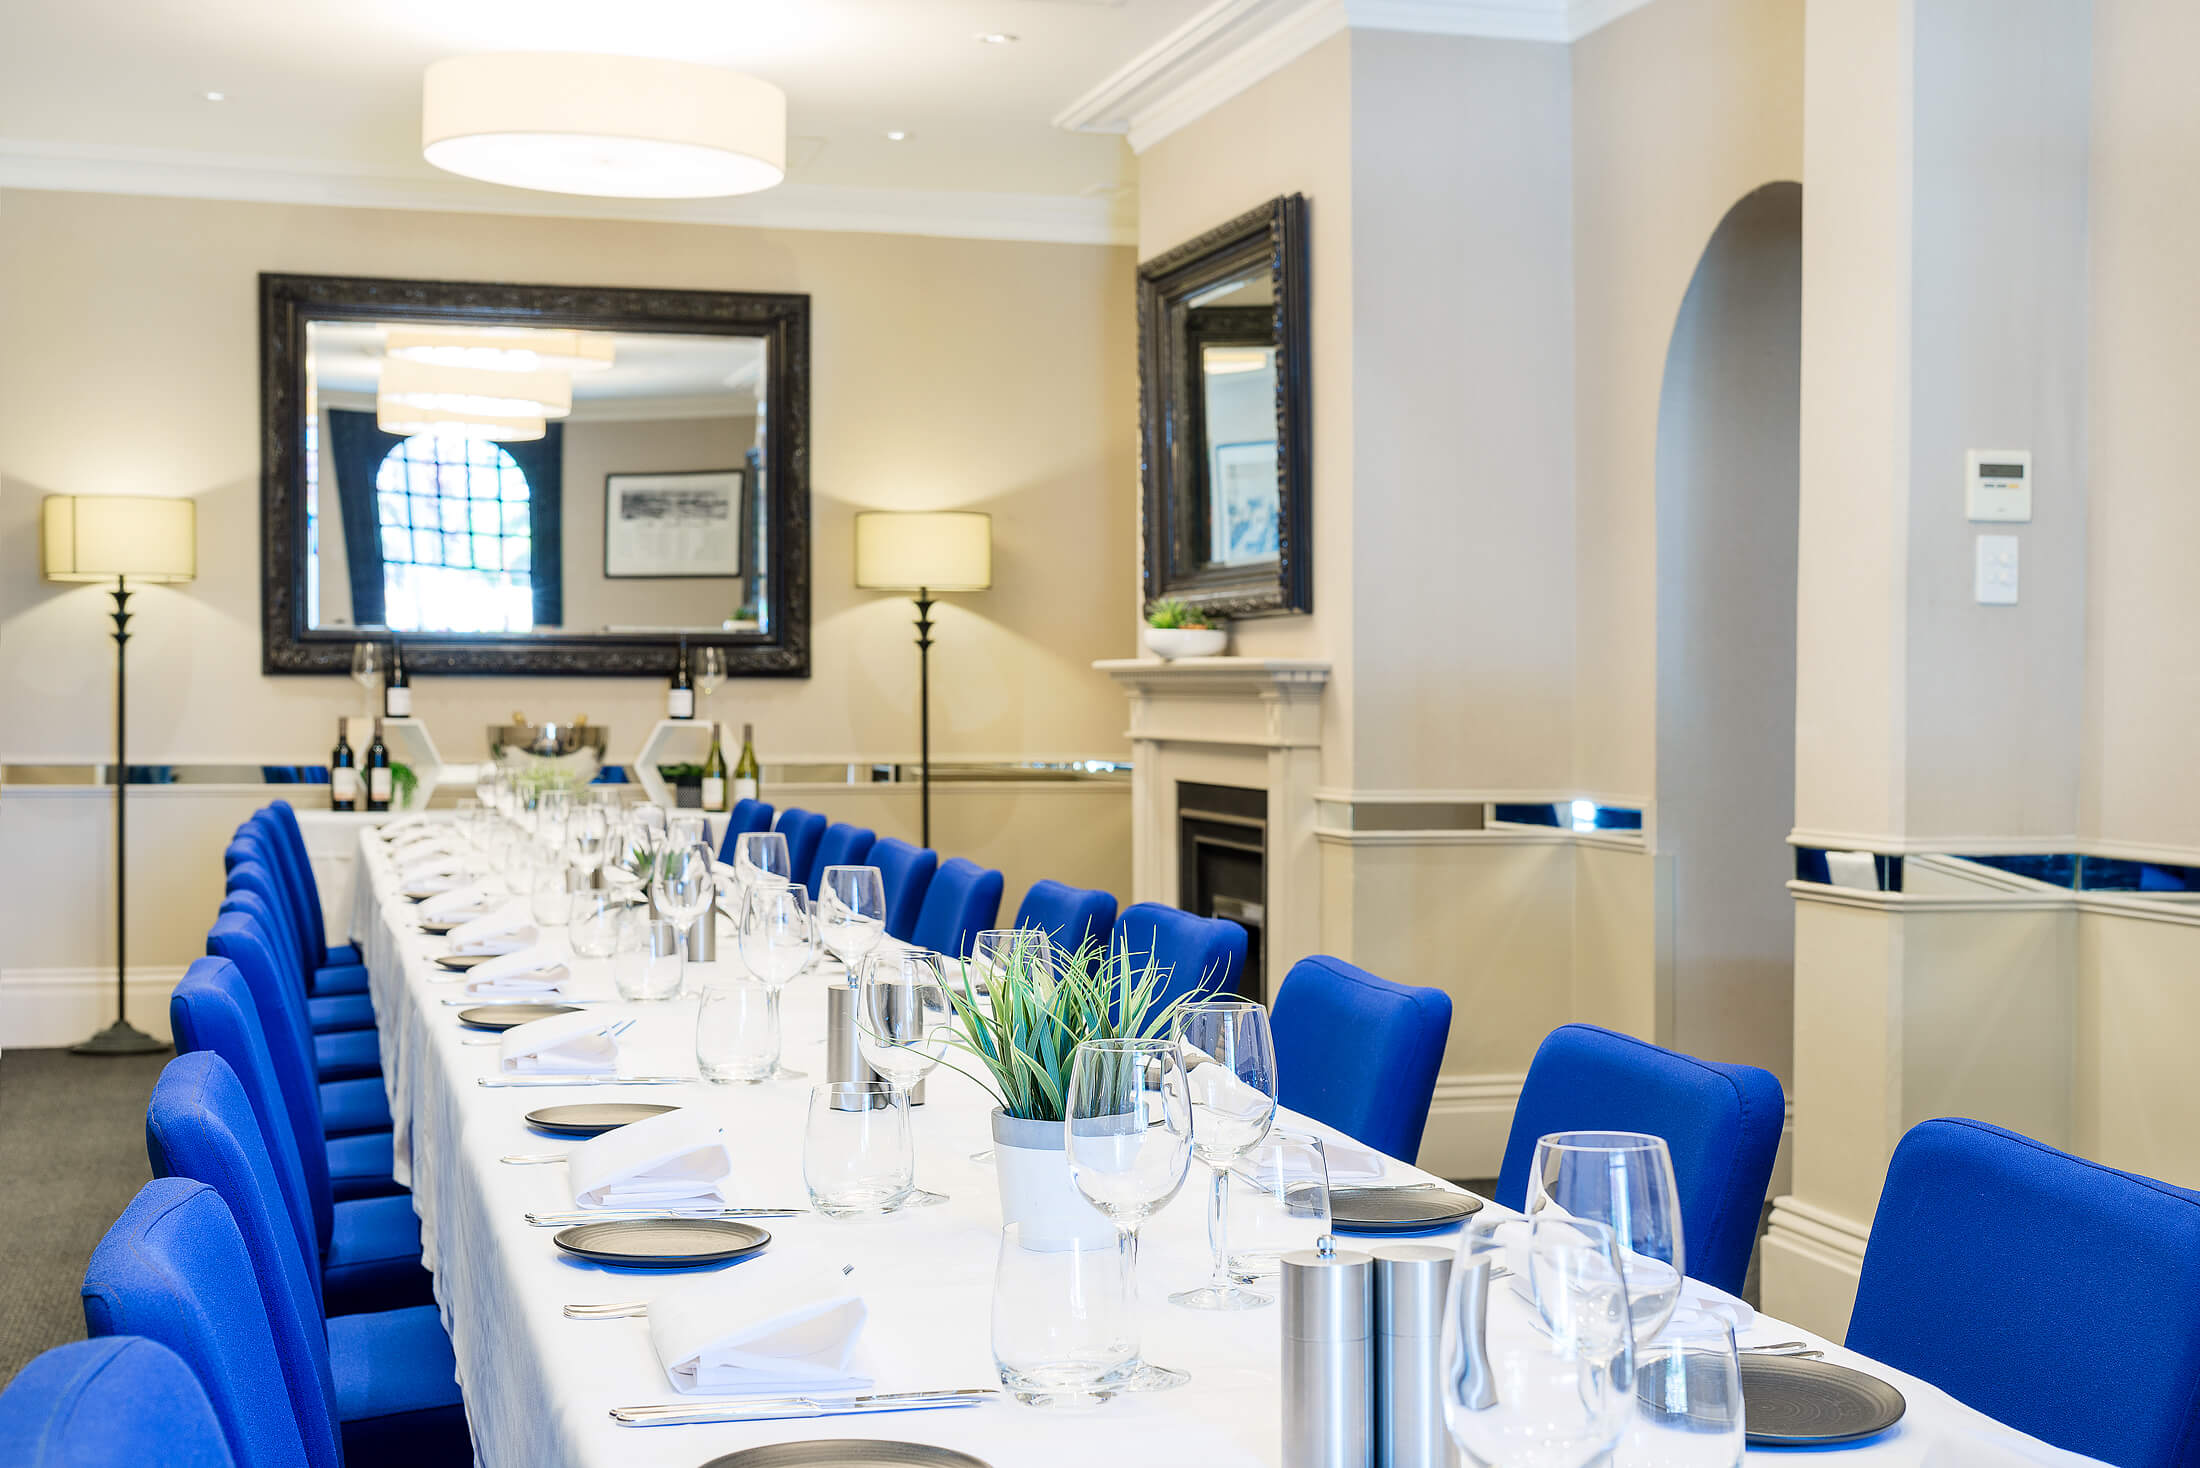 calista-room private function room hire - venue hire - esplanade hotel fremantle by rydges